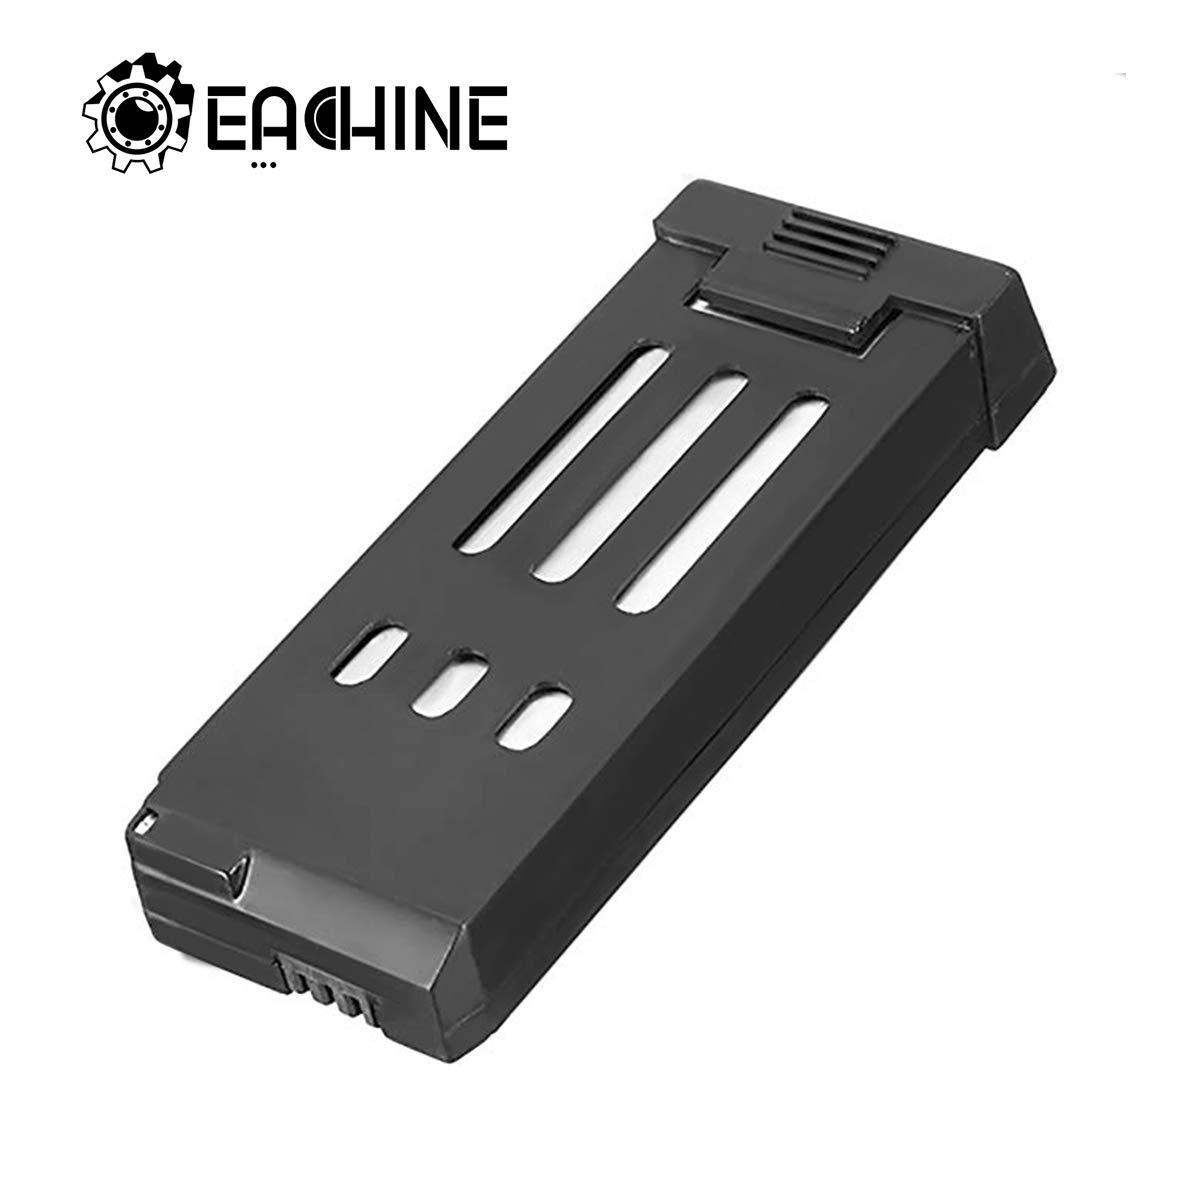 EACHINE Original E58 Battery Spare Parts 3.7V 500MAH Lipo Battery for E58 WiFi FPV RC Quadcopter Drone x pro